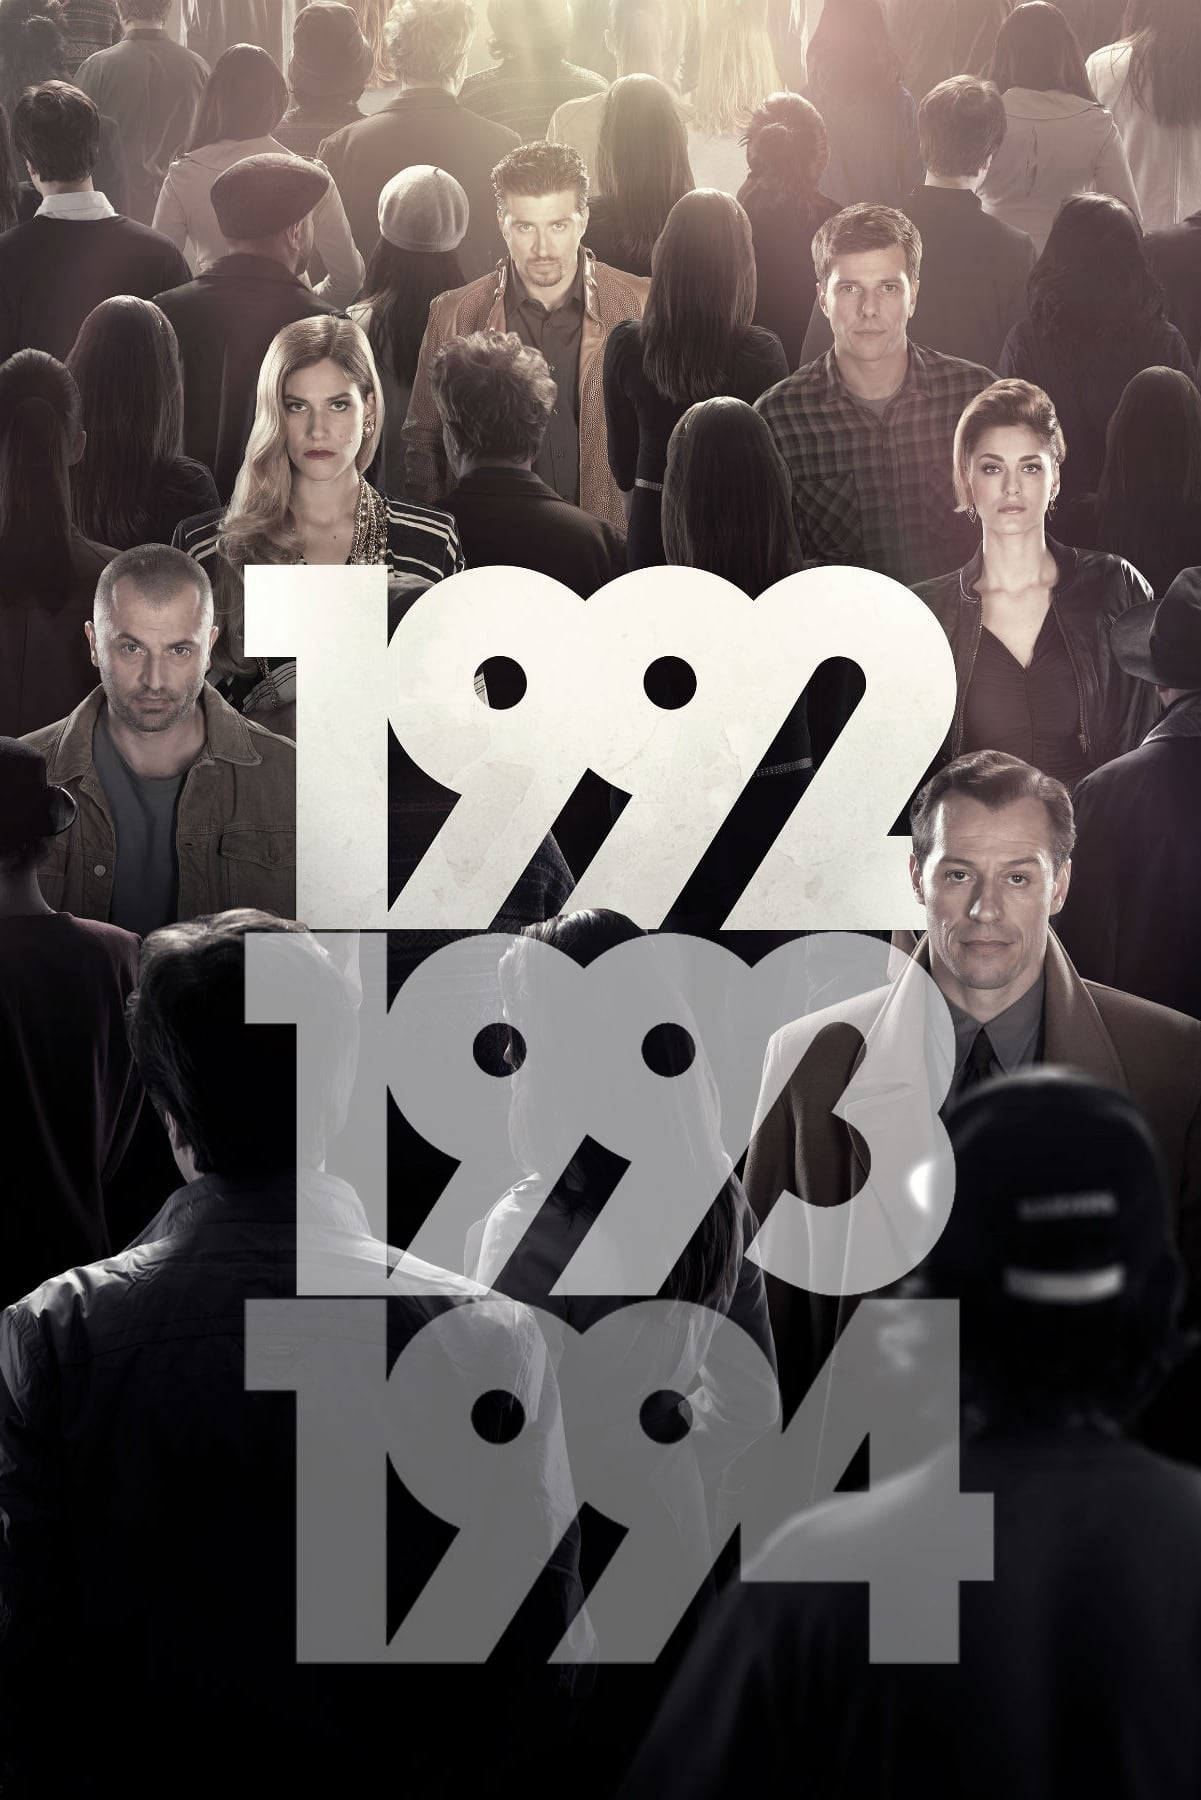 1992 - 1993 - 1994 (2015)